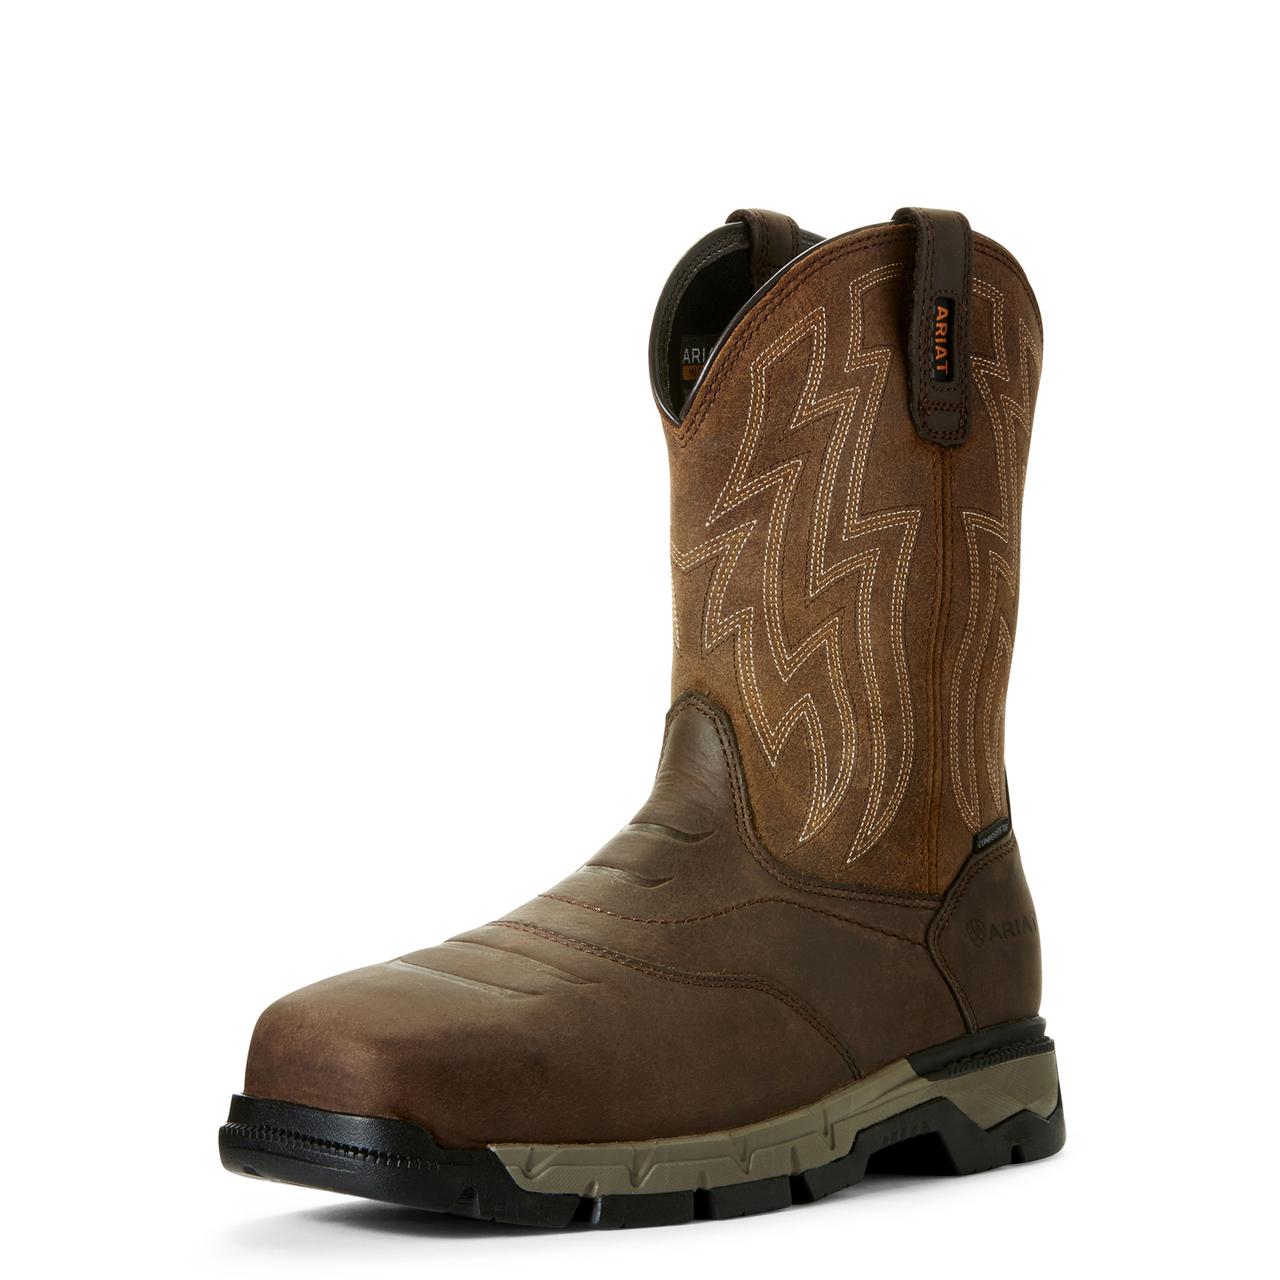 45df26627711 Rebar Flex Western CT Brown Wicker - The Boot Life